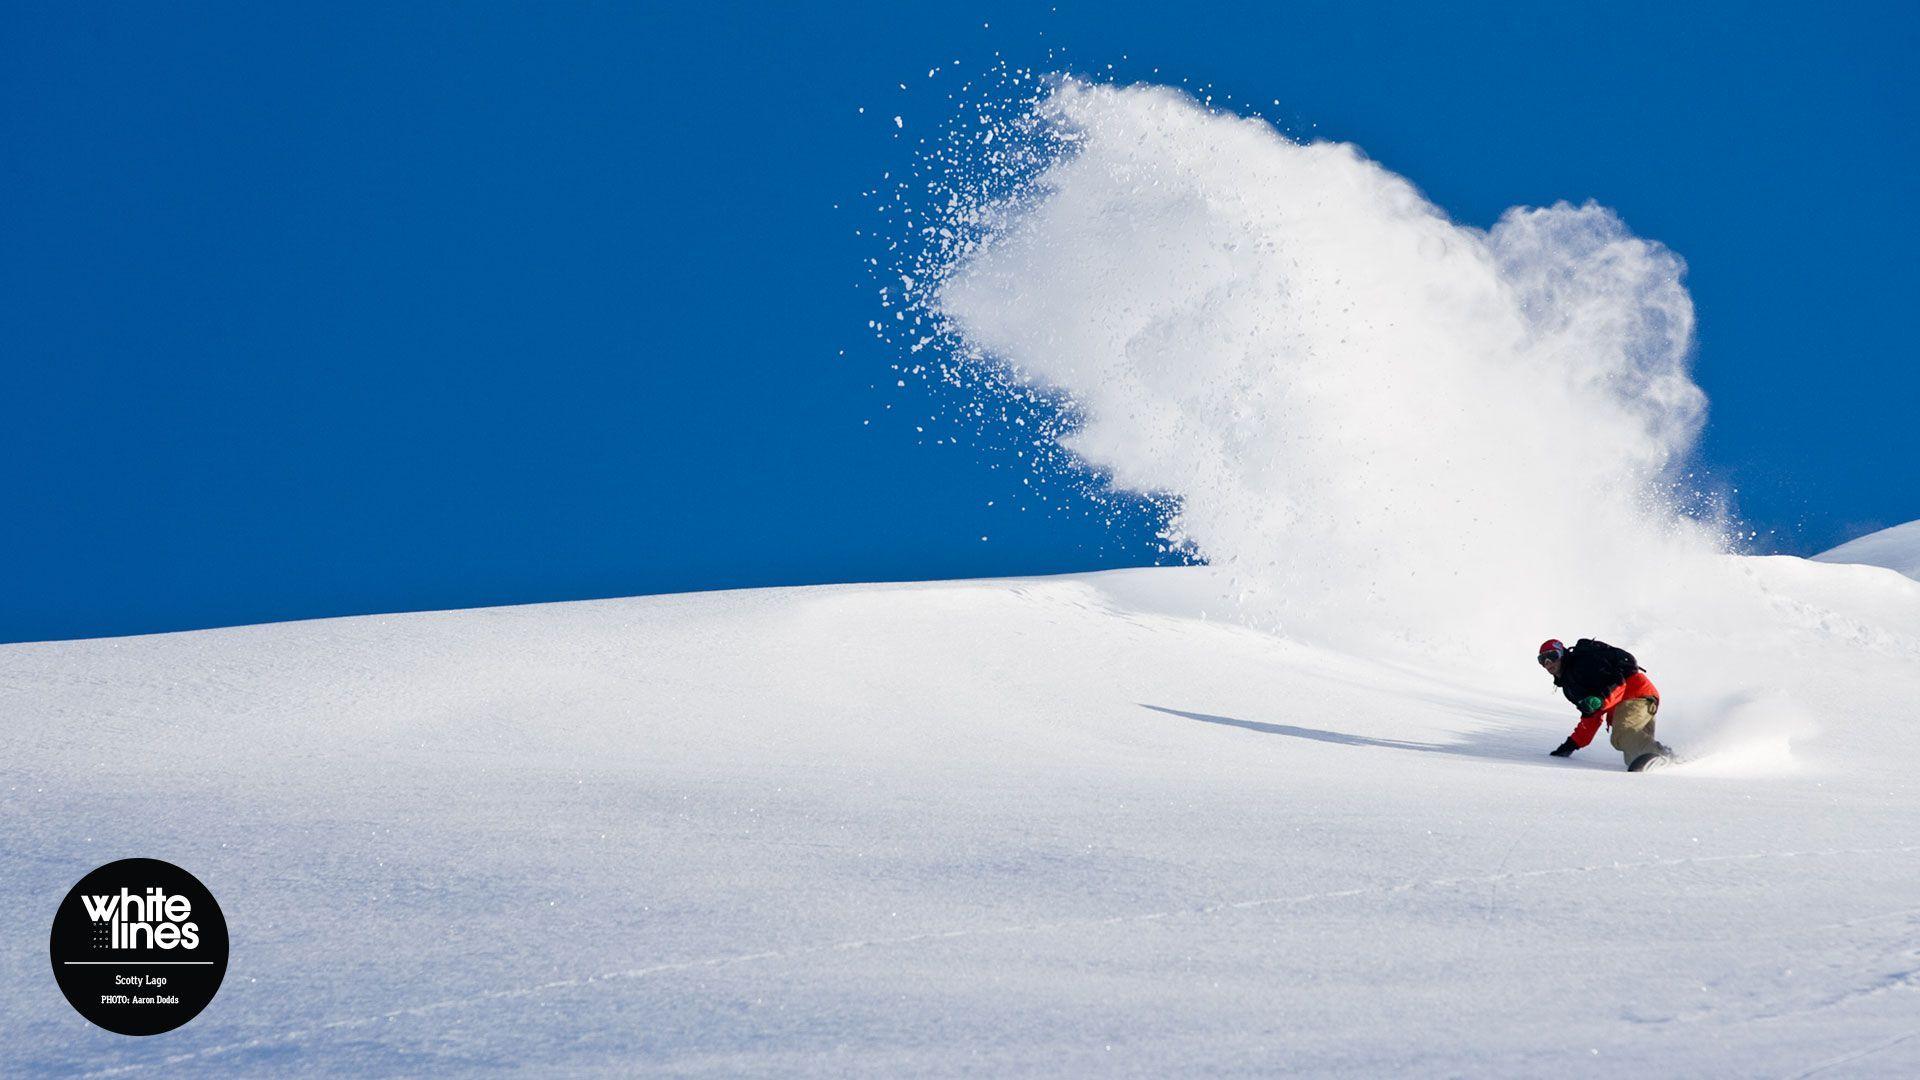 HD Snowboards Wallpaper